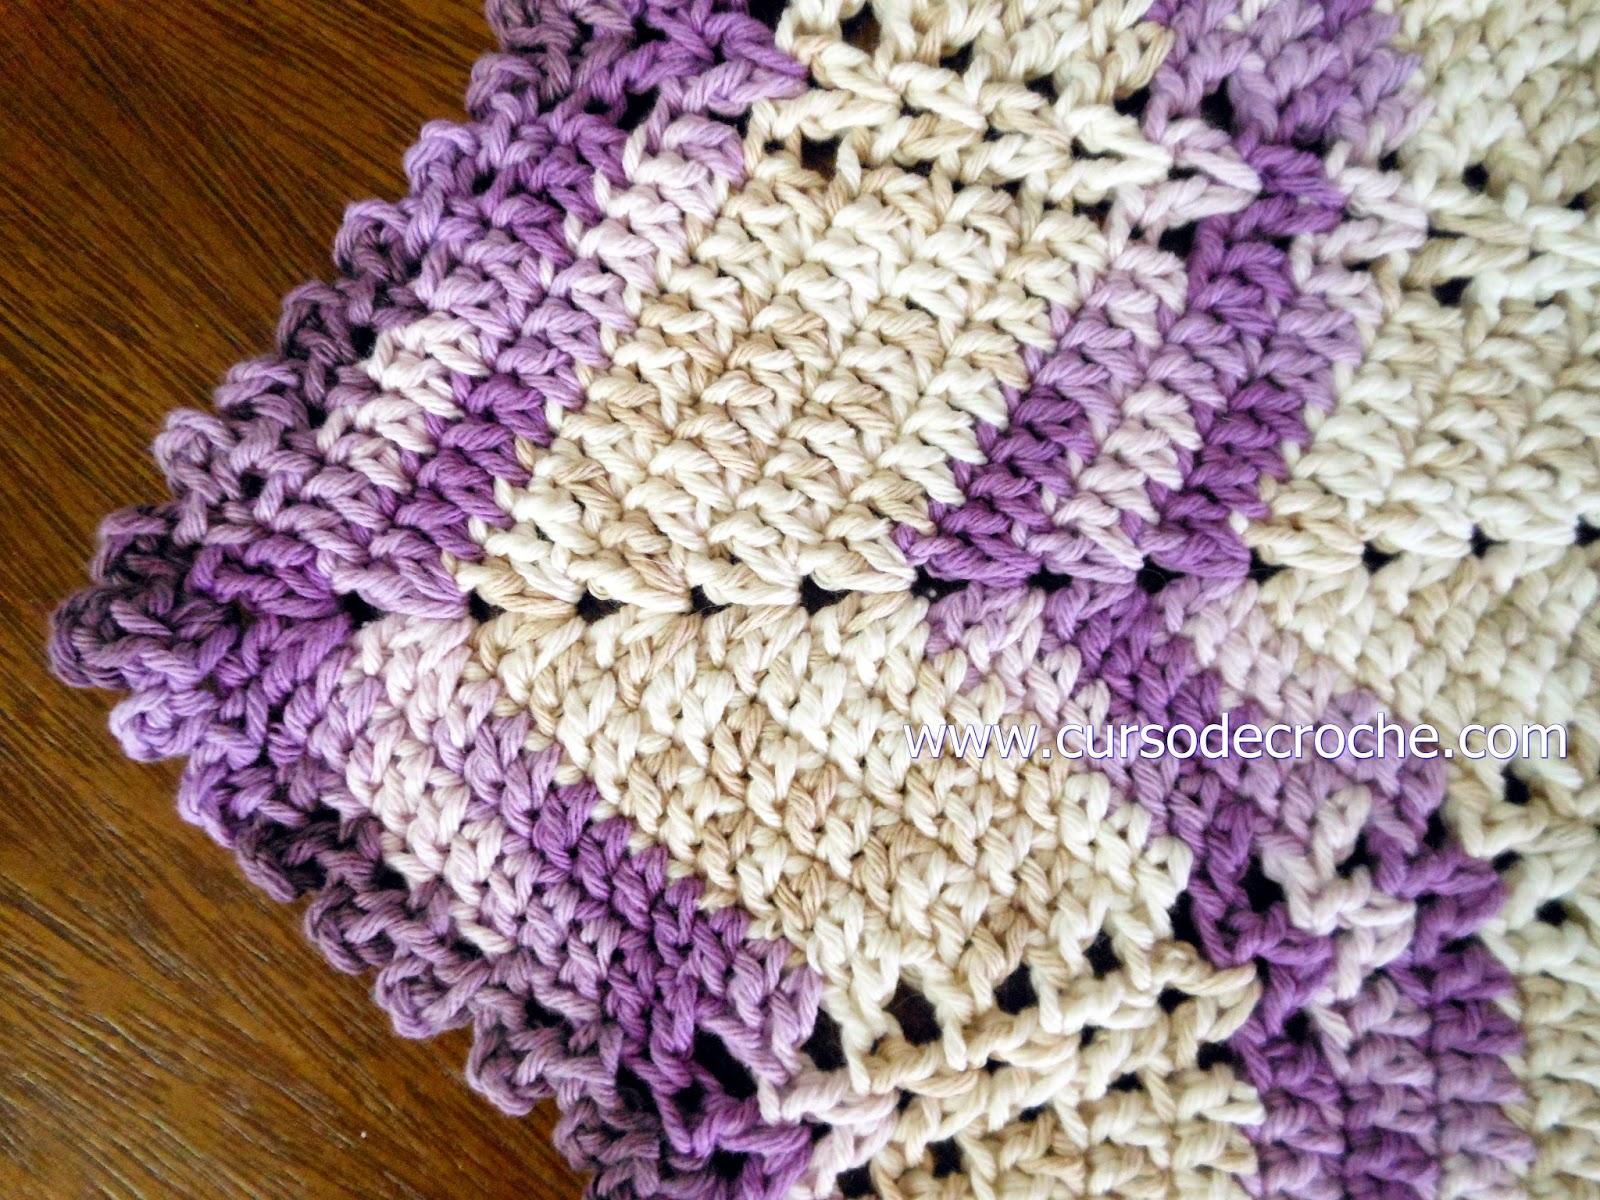 tapetes em croche disponiveis para venda na loja curso de croche